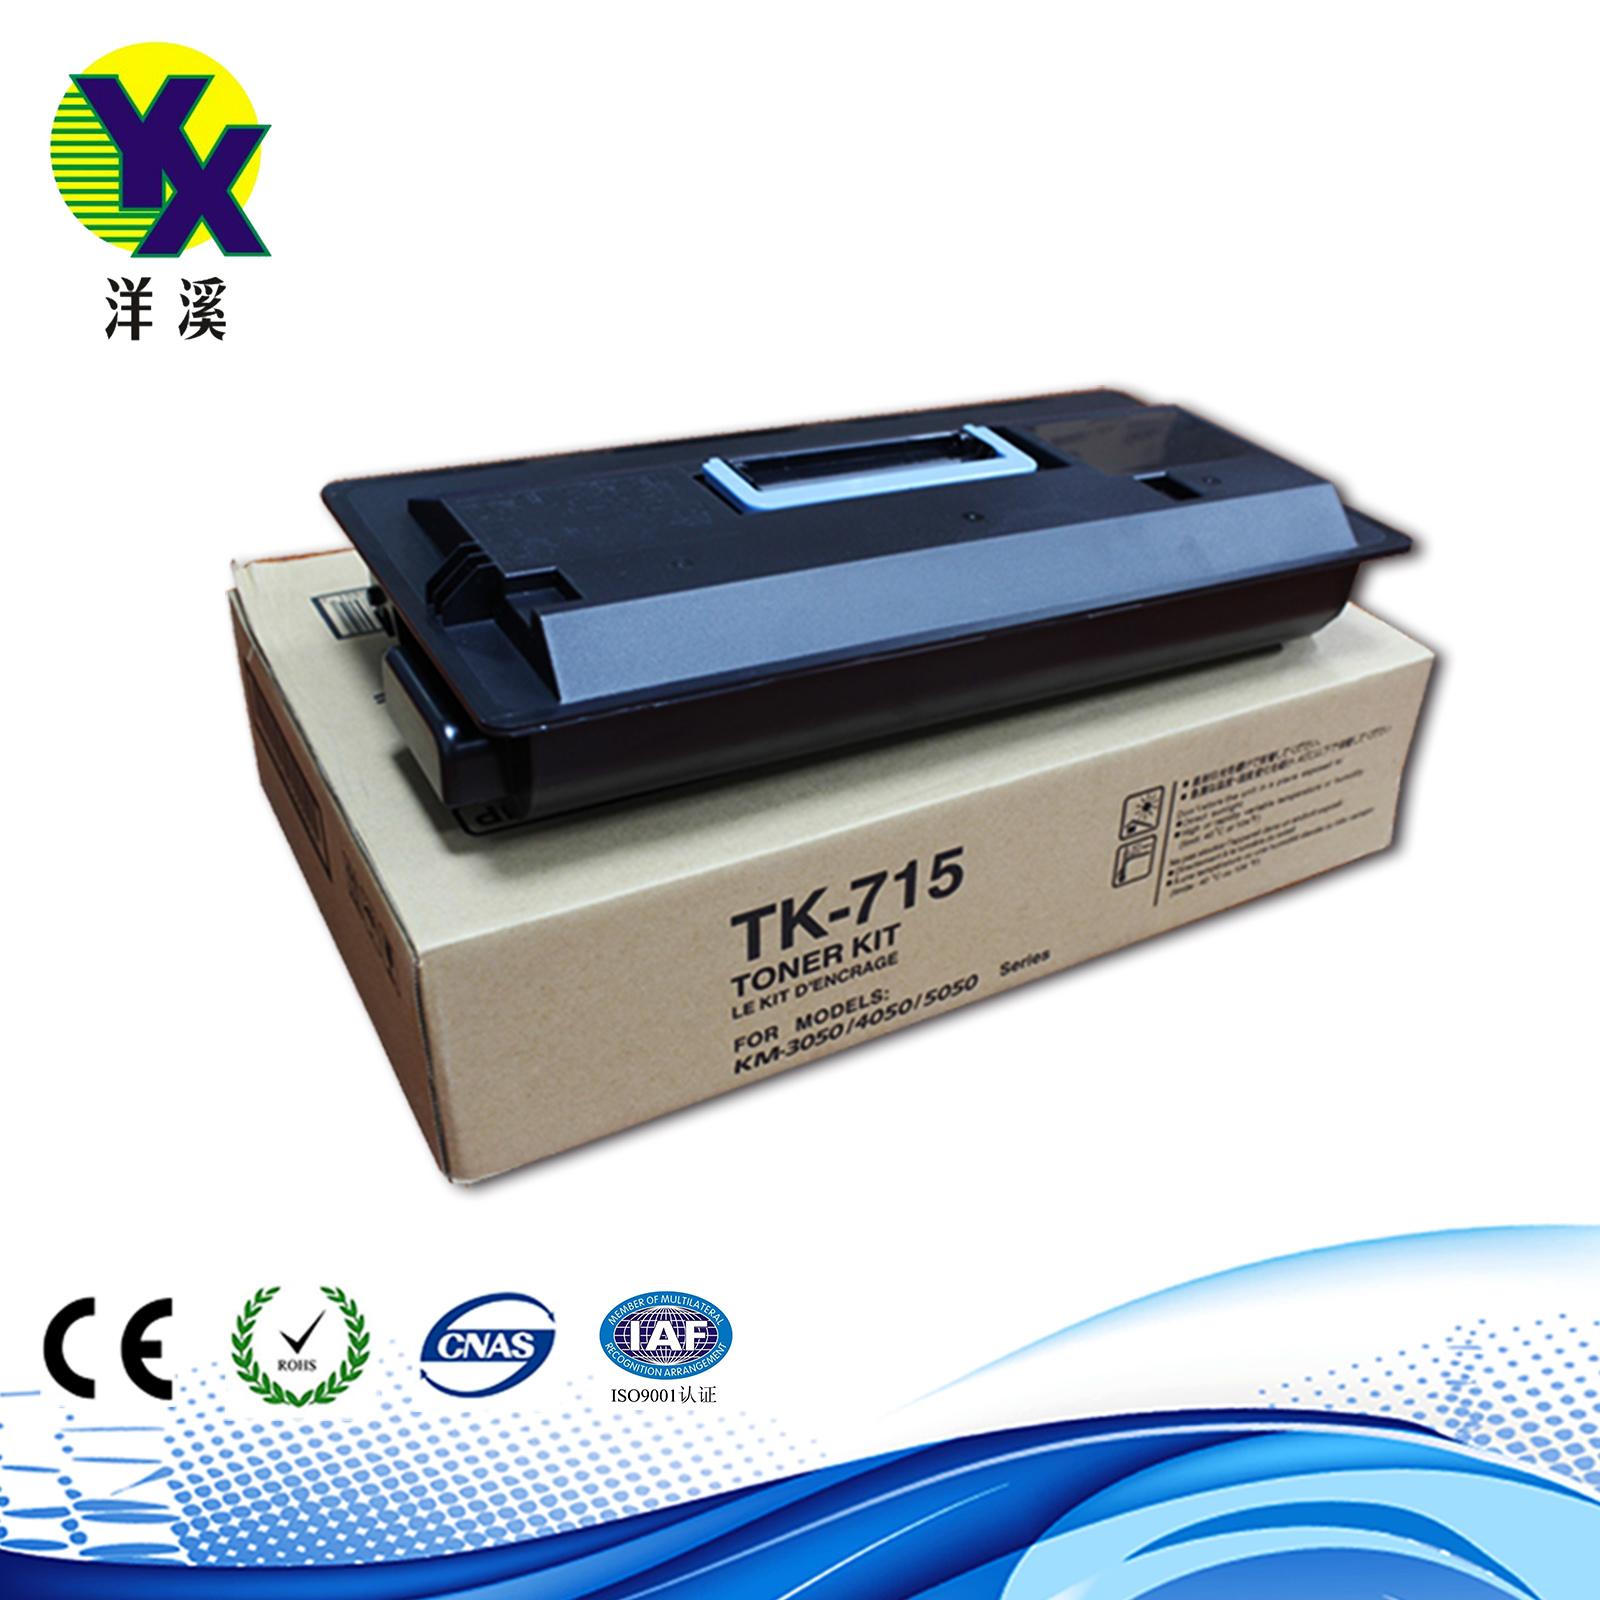 Compatible Kyocera toner cartridge TK715